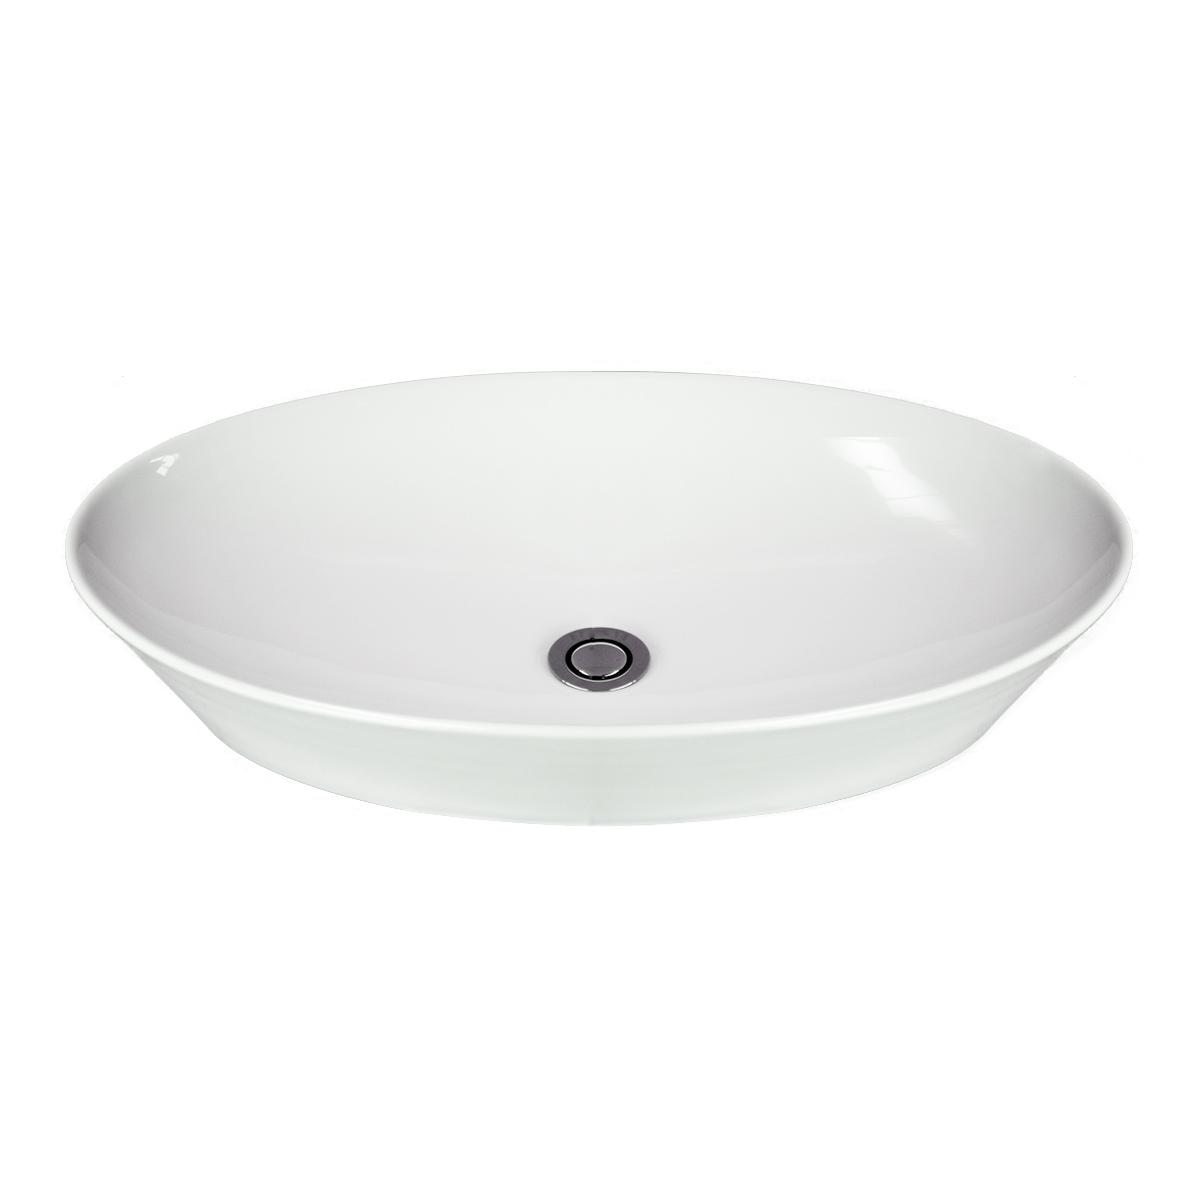 Ceres counter top basin ceramic